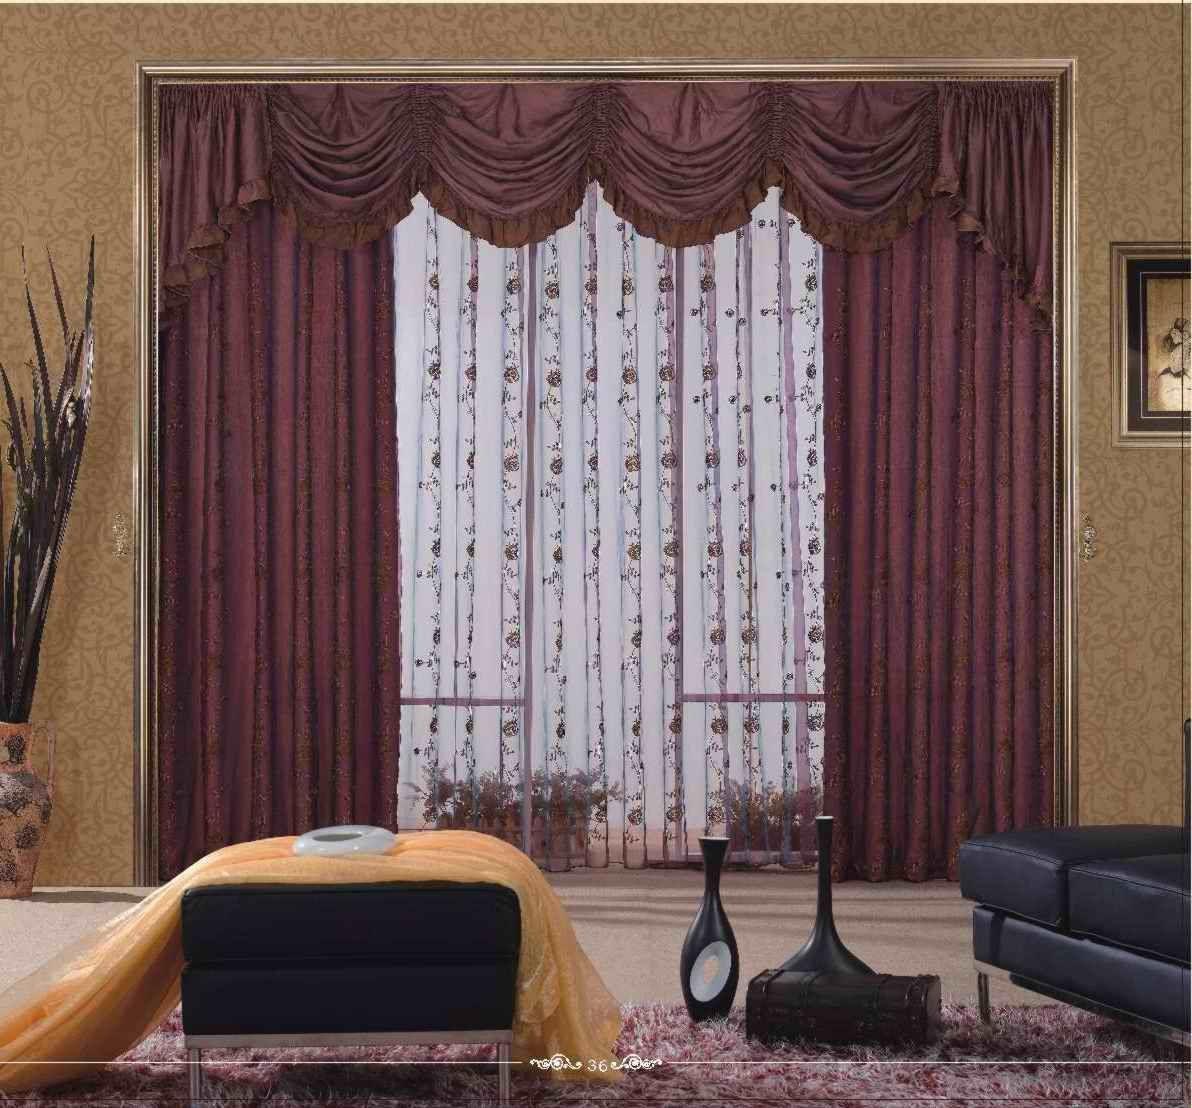 arab style curtains - buy arab style curtains,european style